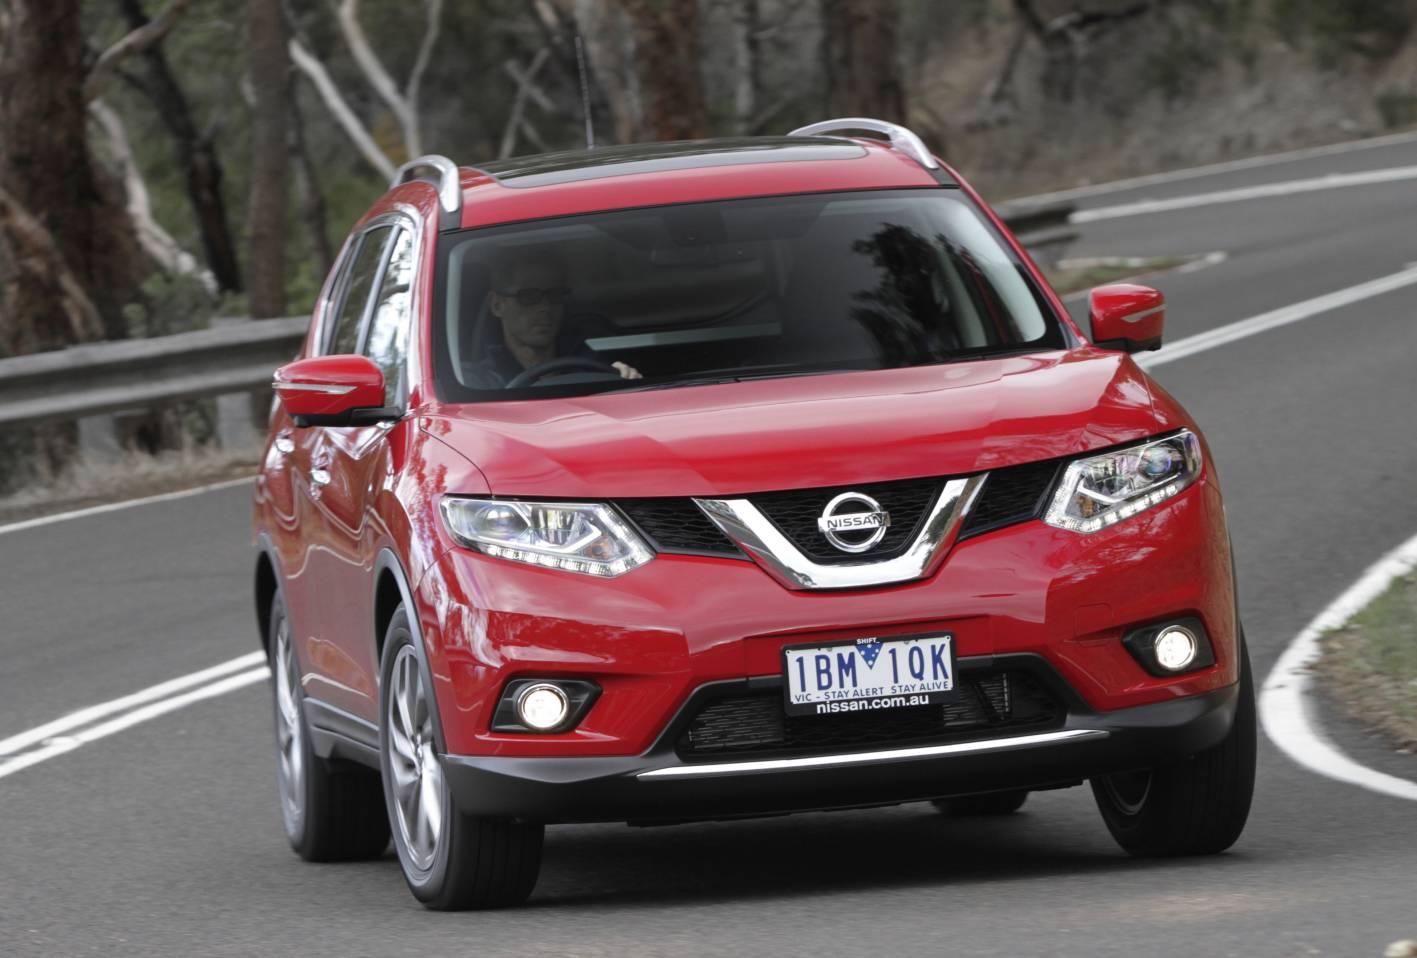 2014 Nissan X-Trail 11.jpg